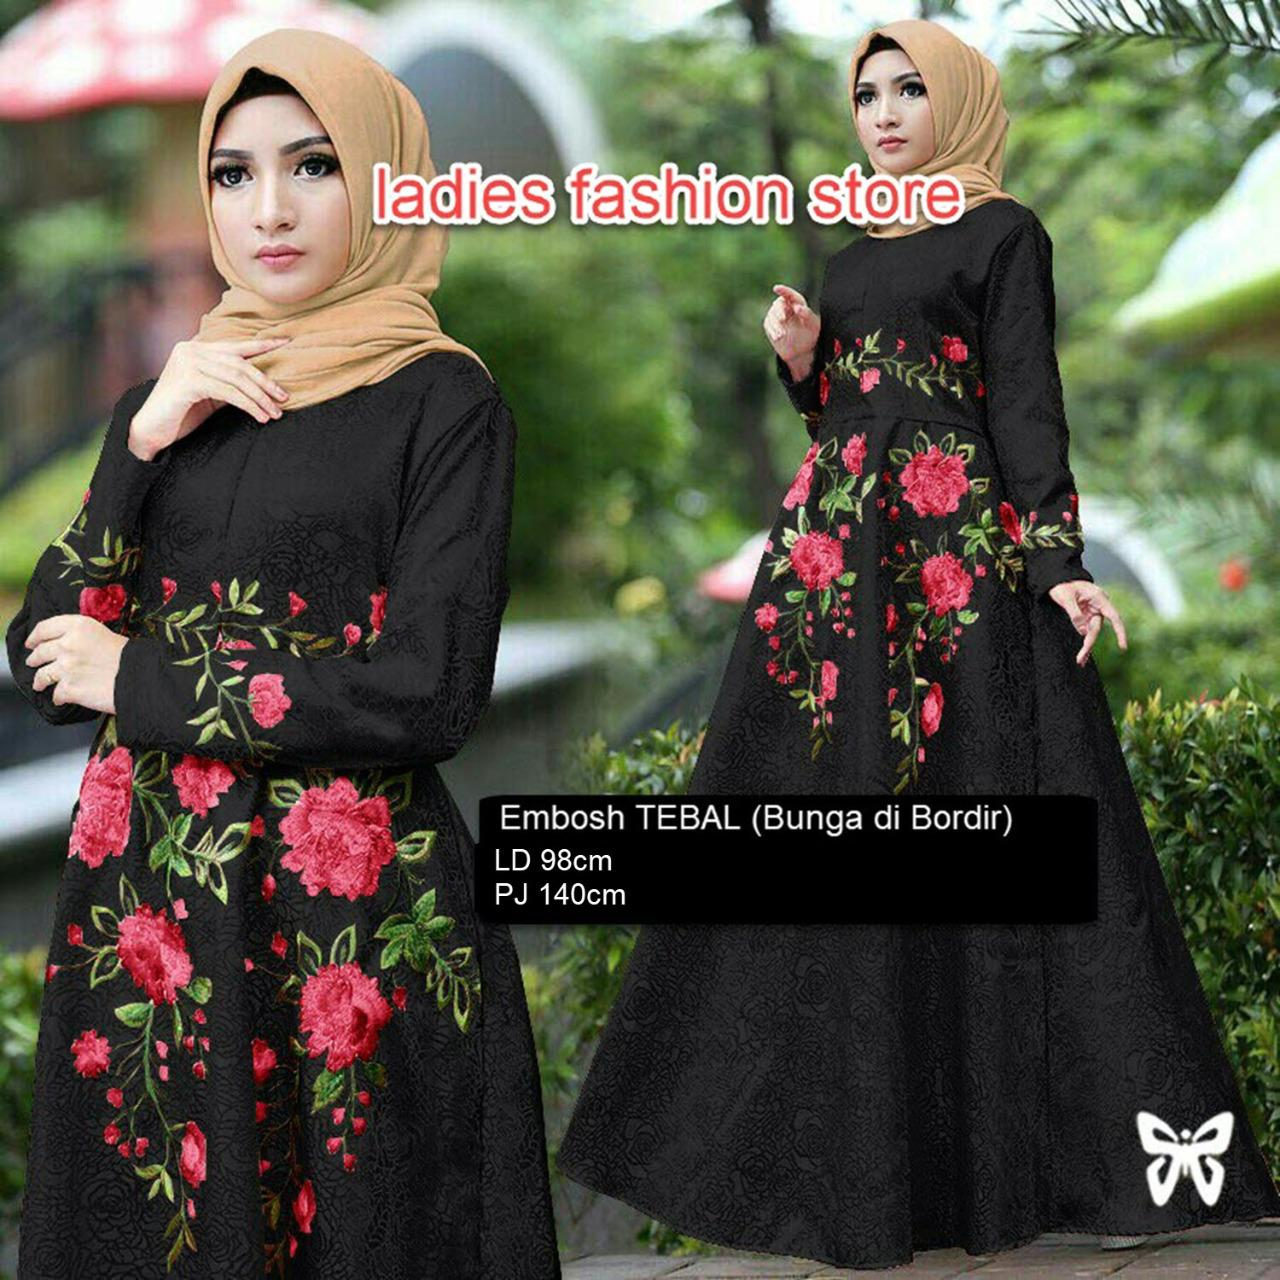 Baju Wanita Shop Dress Gamis Muslim Iyana/ Set Terusan Maxi Hijab Syar'i/ Syari Simple Elegant / Baju Muslimah Wanita / Kebaya Modern Baloteli Tanpa Pasmina (anaay) SS - HItam / Gaun Pesta